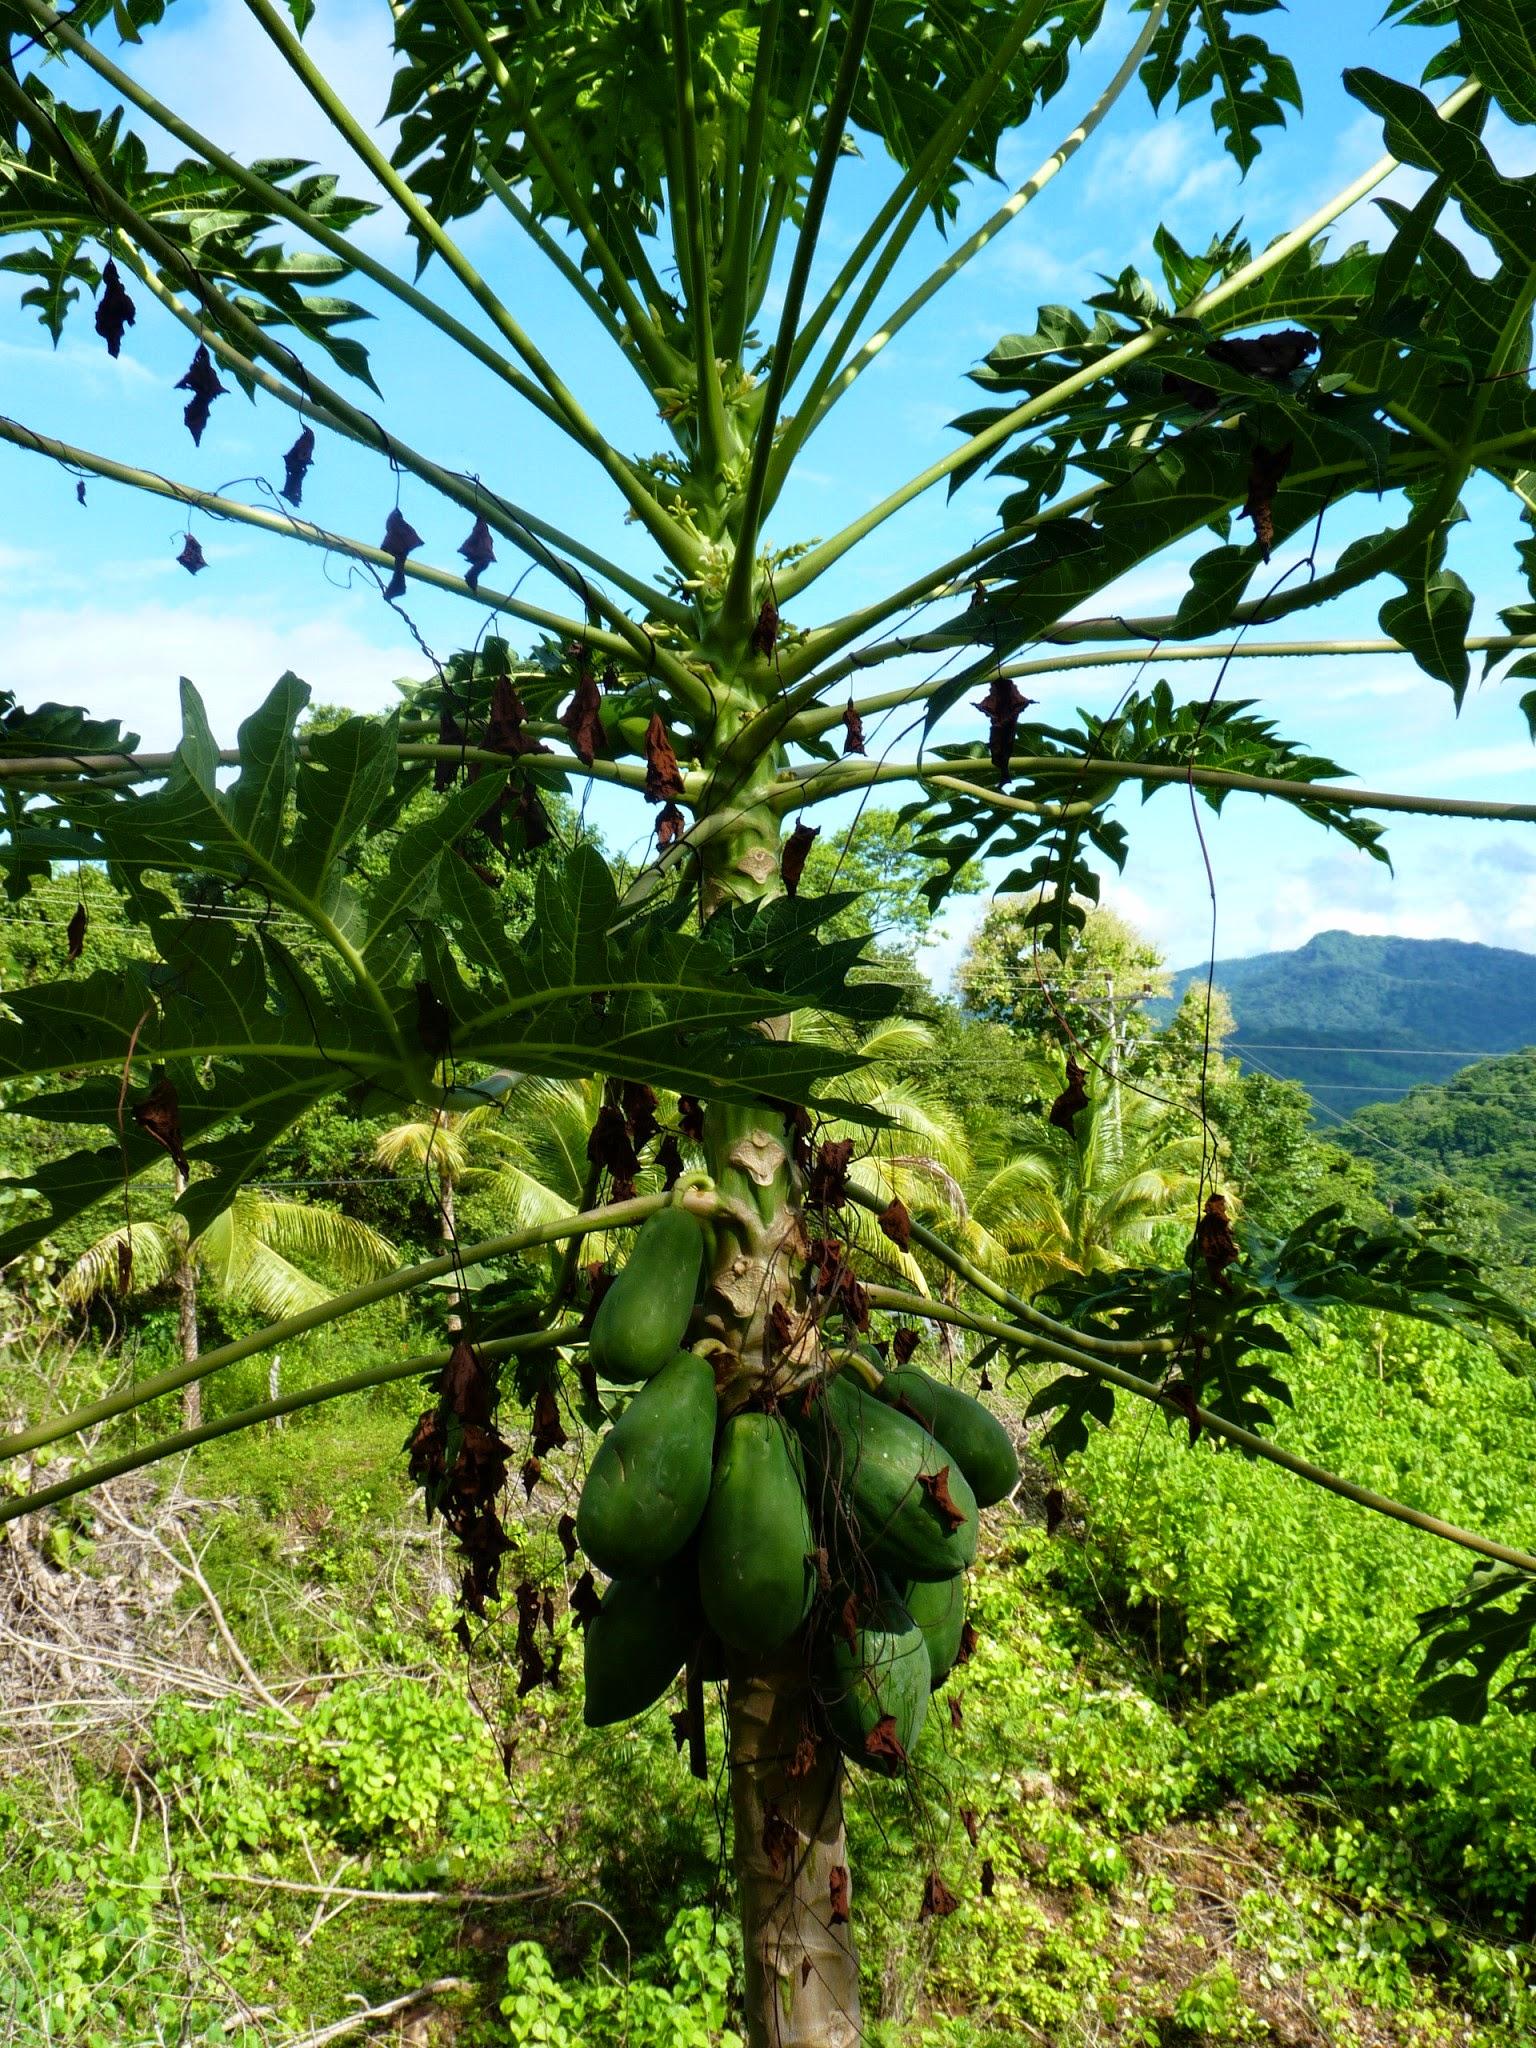 papaya tree and its fruit